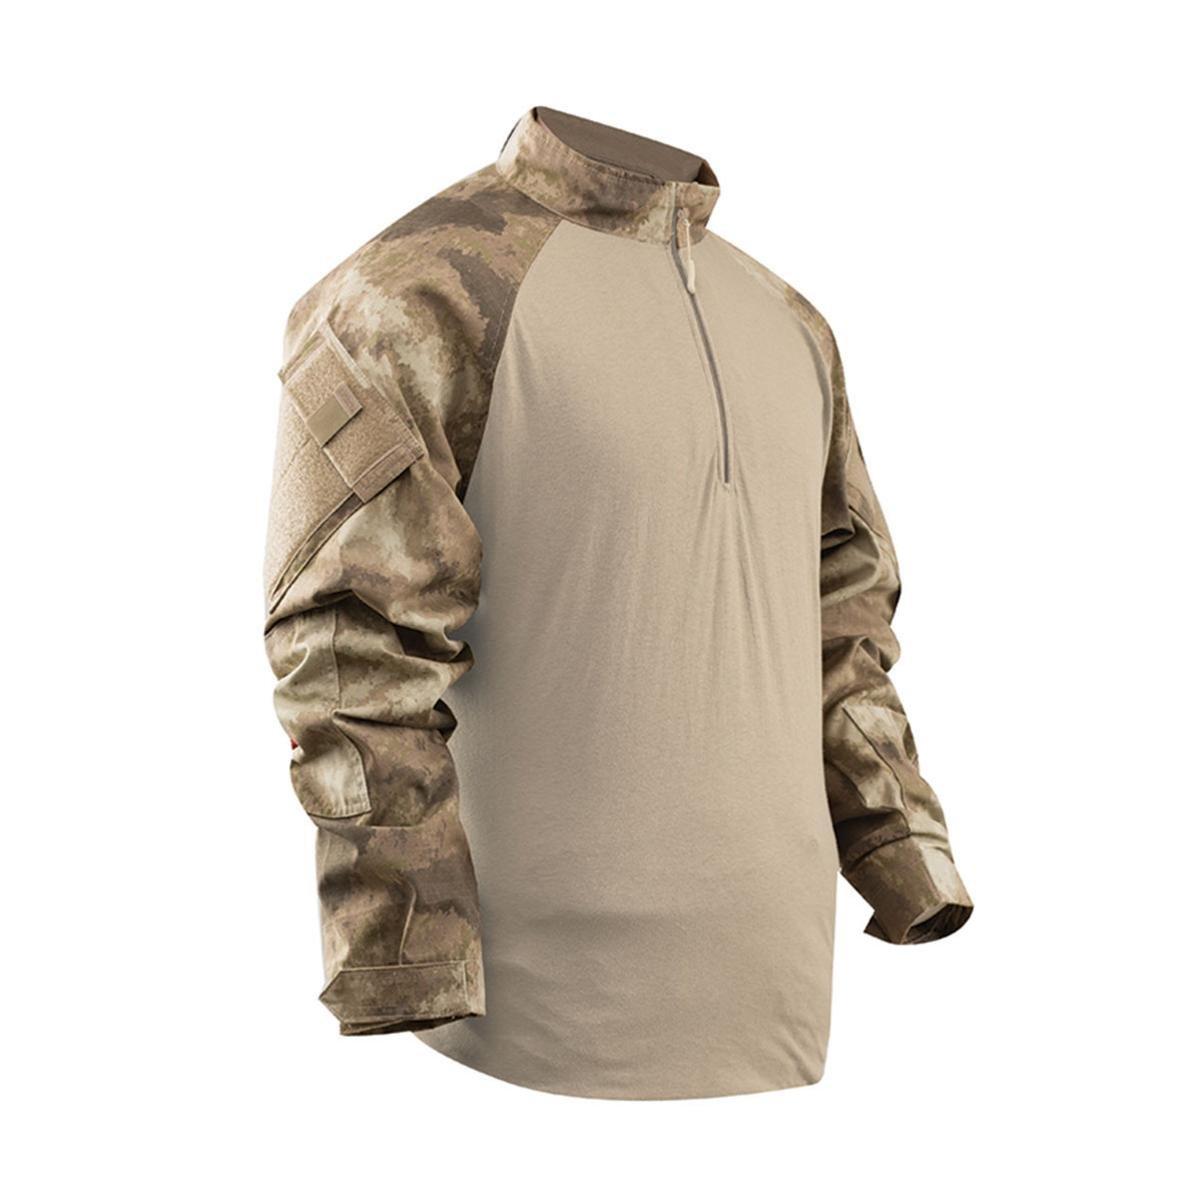 Tru-Spec Combat Shirt